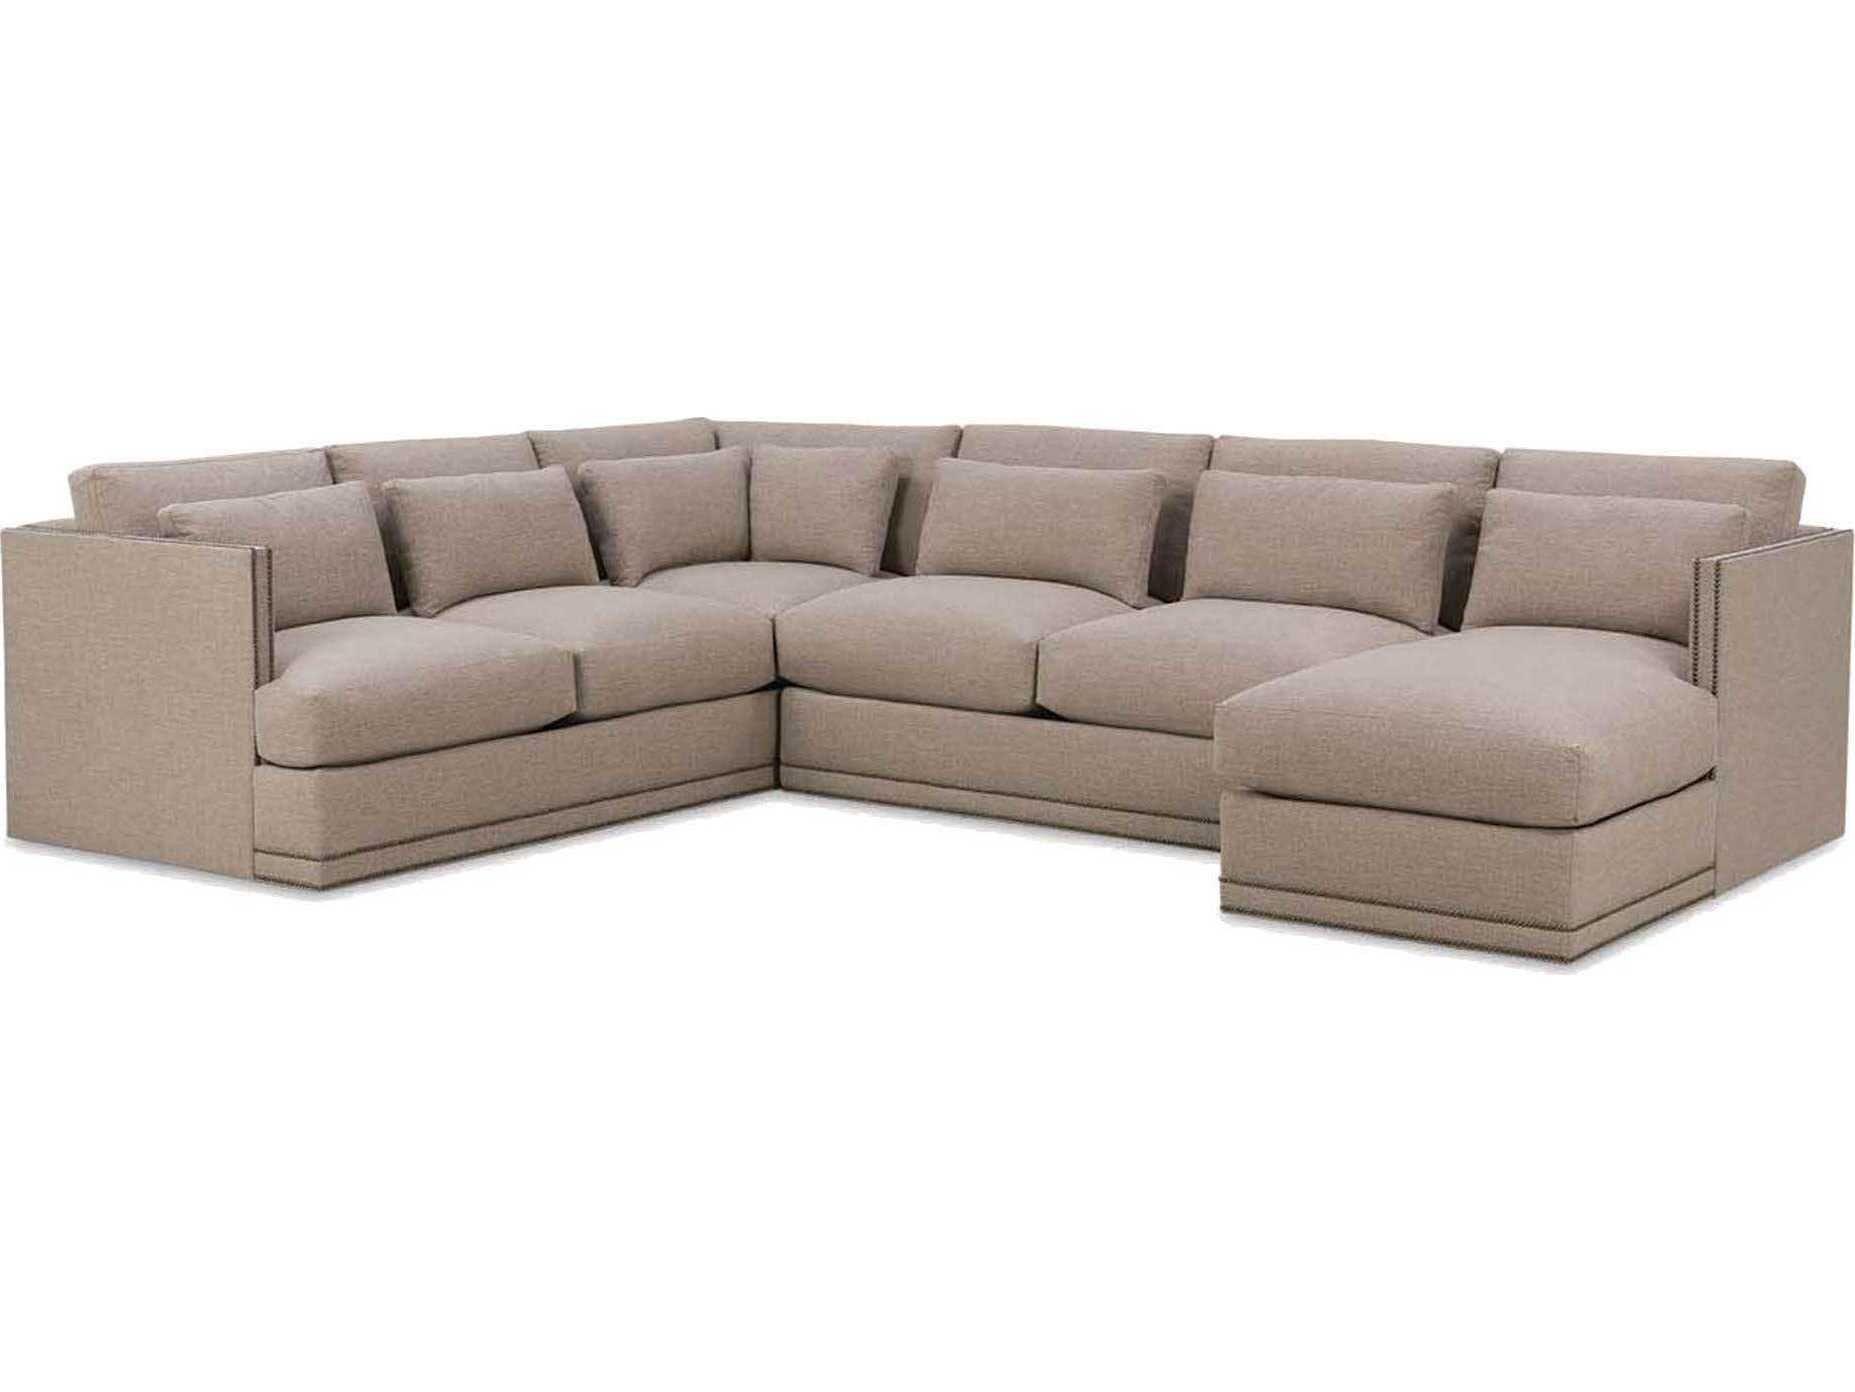 Rowe Furniture Oscar Sectional Sofa Fabric